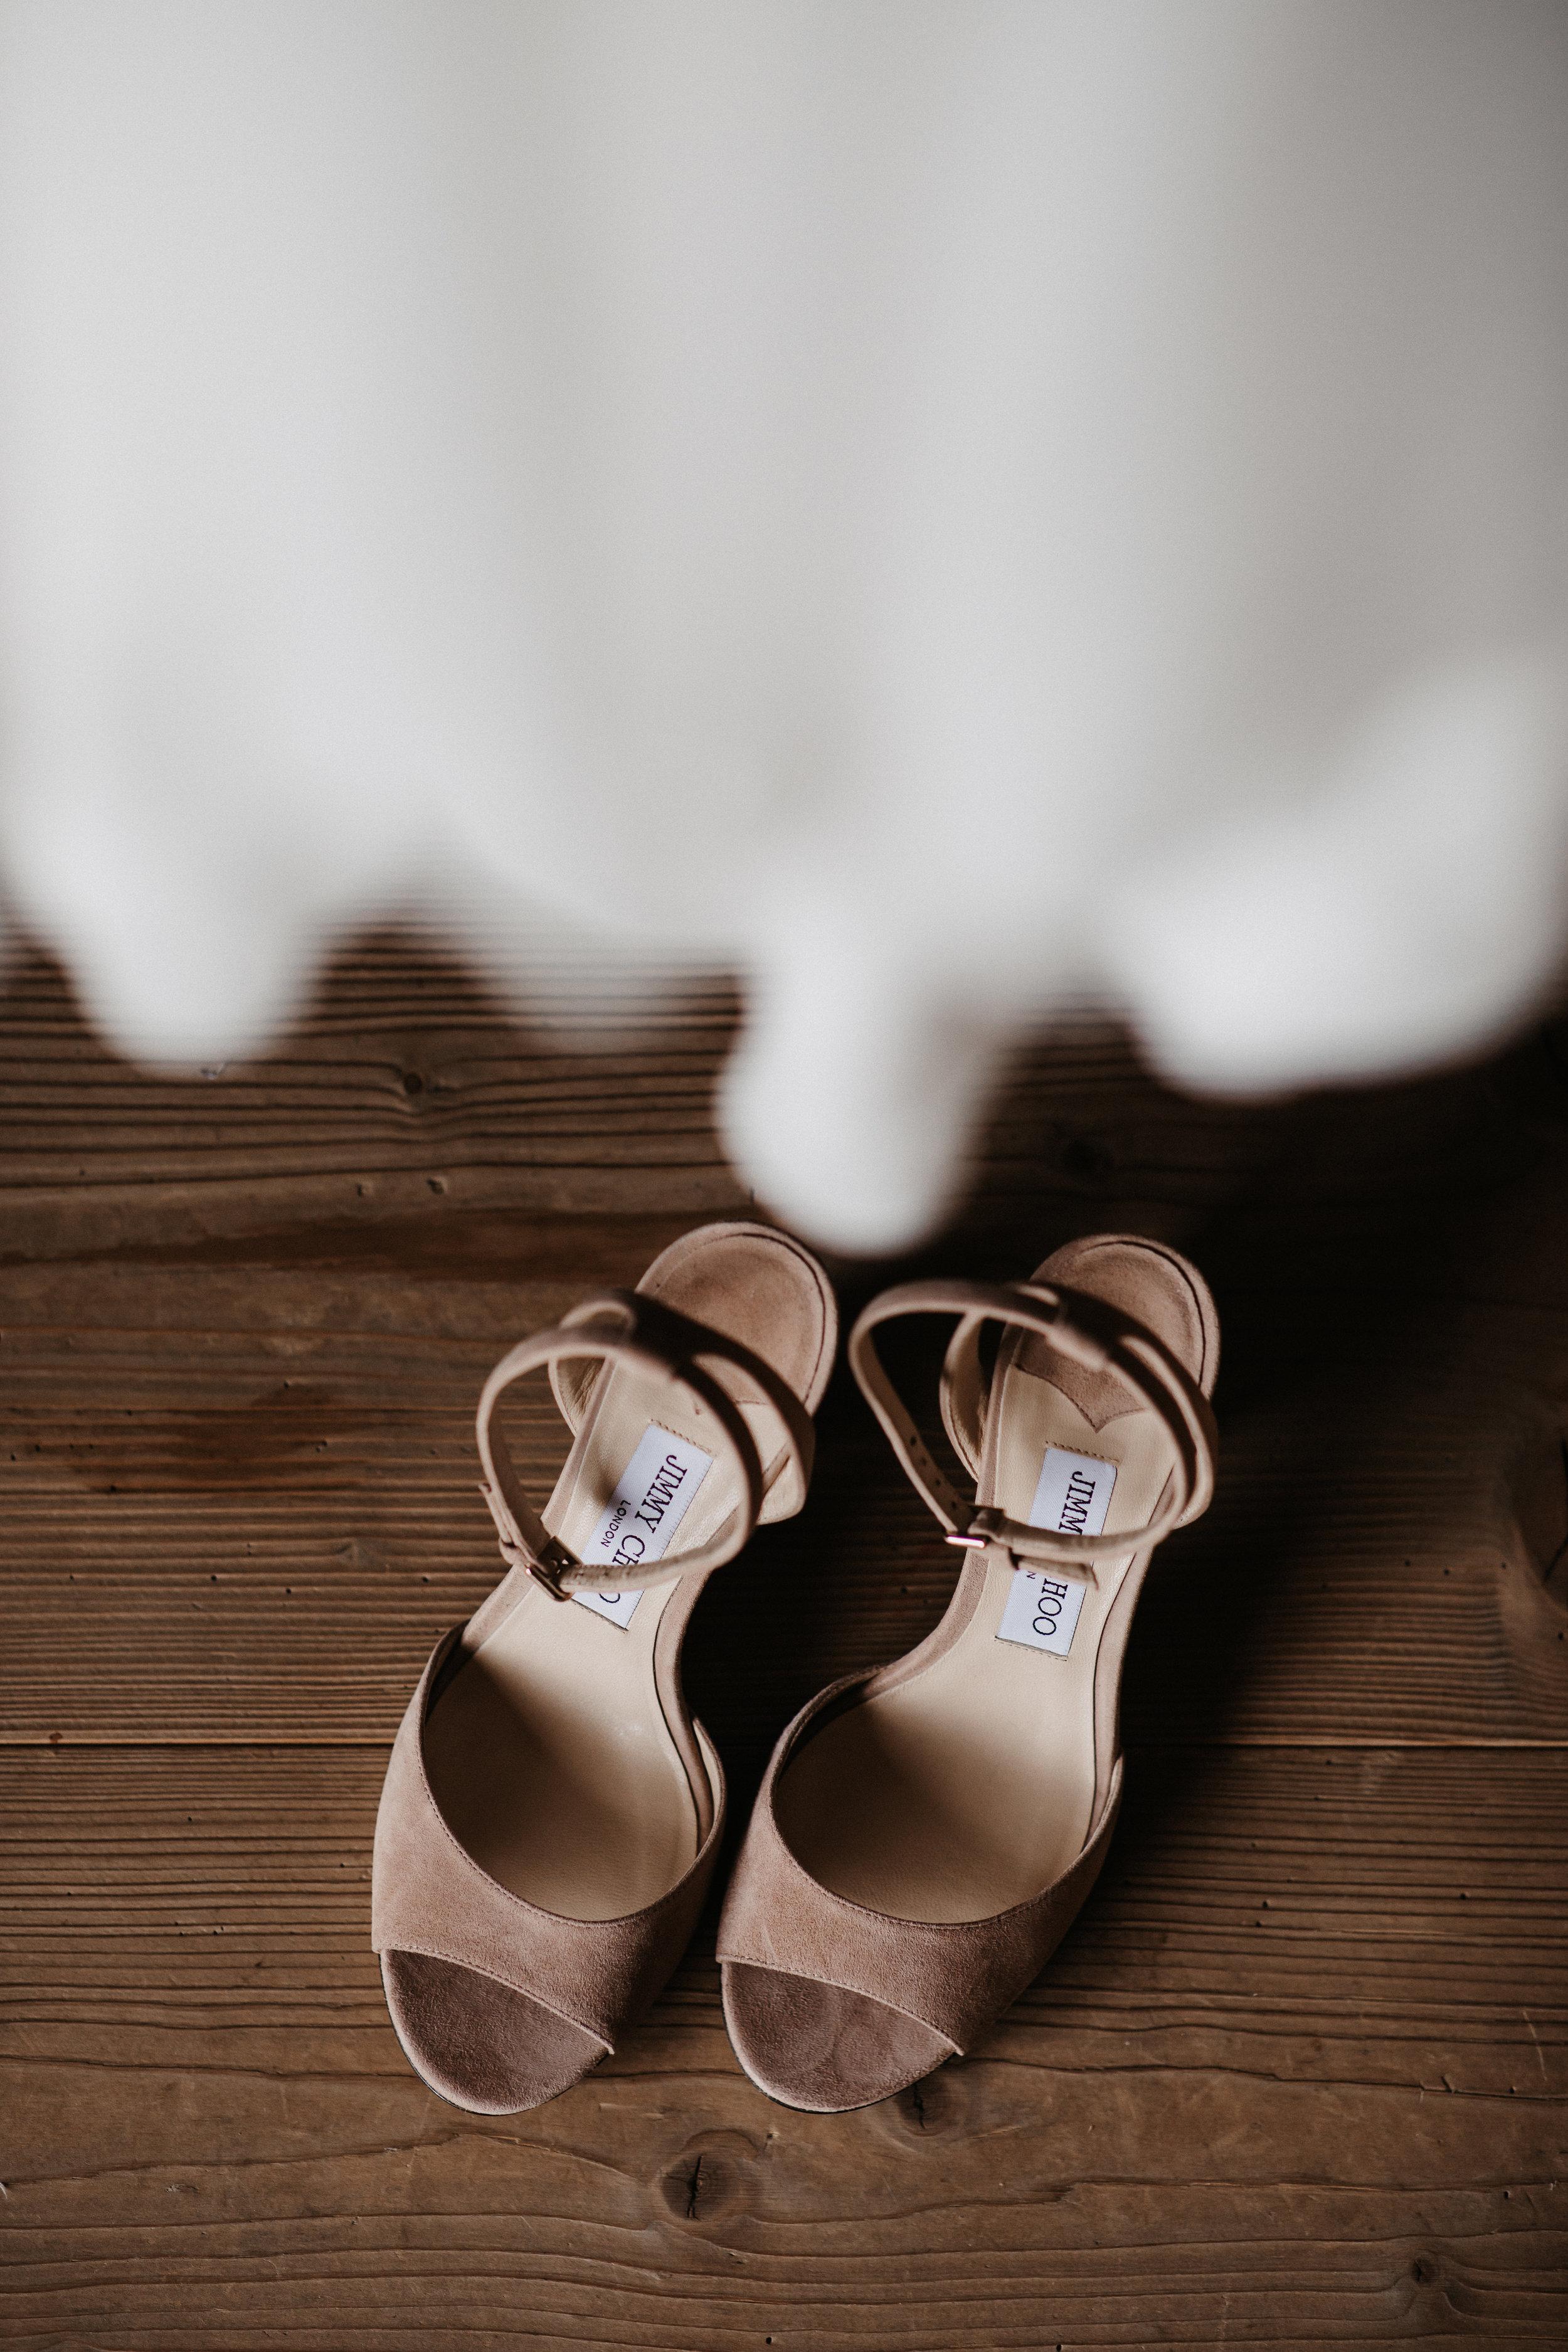 rosemarrylemon_ab_Hochzeitsplanung9.jpg